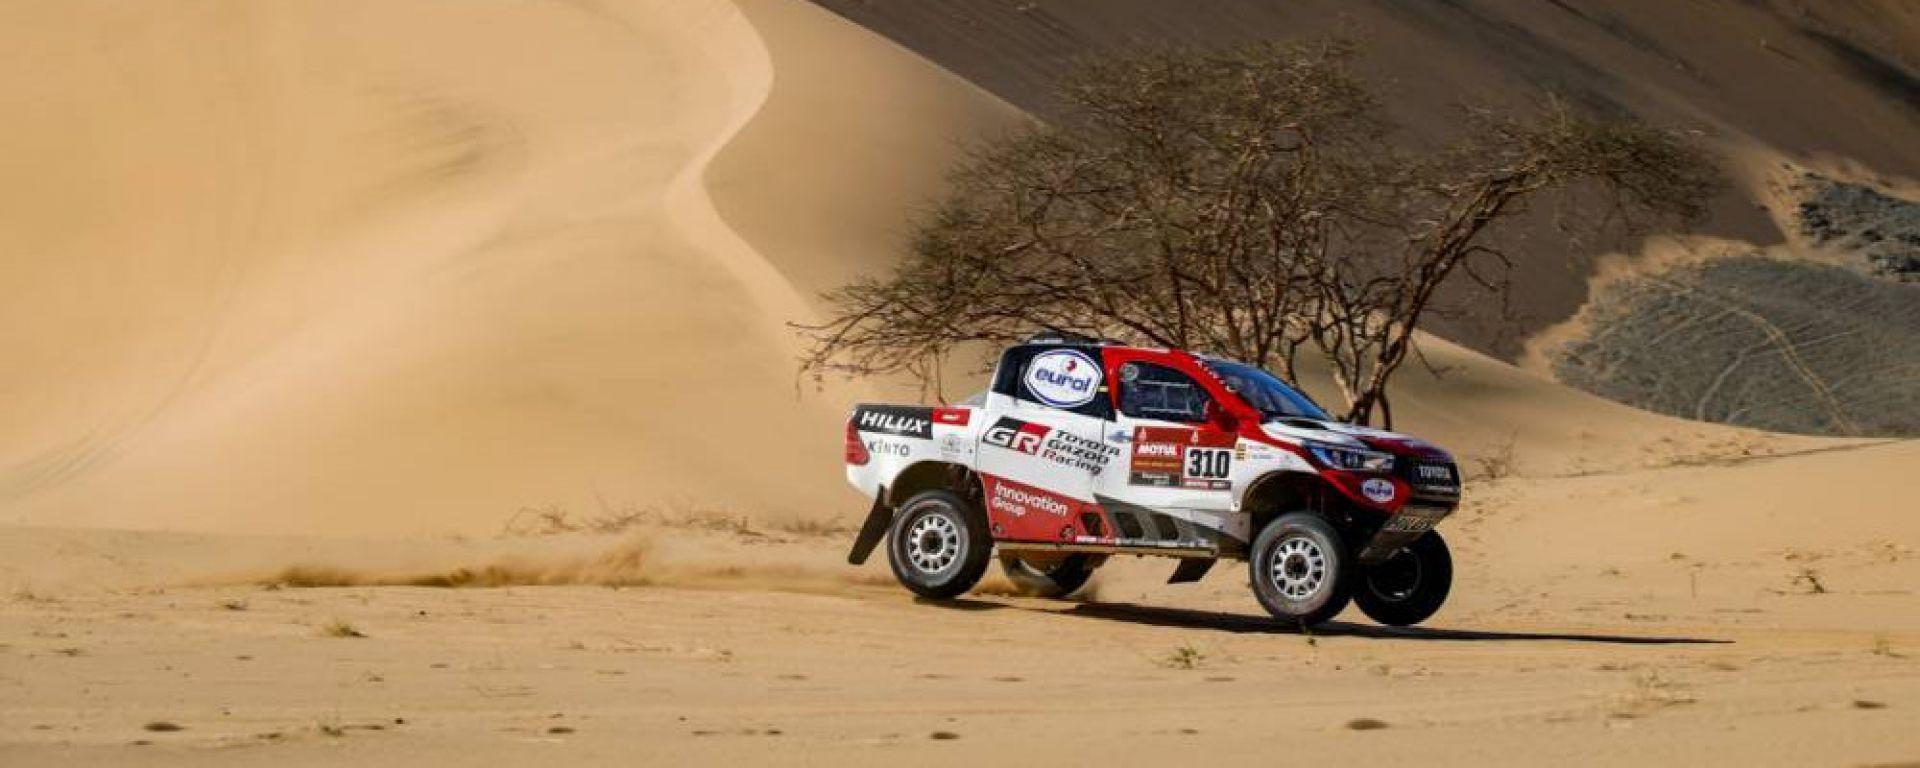 Dakar 2020, Tappa 1: Esteve Pujol e Txema Villalobos (BMW)